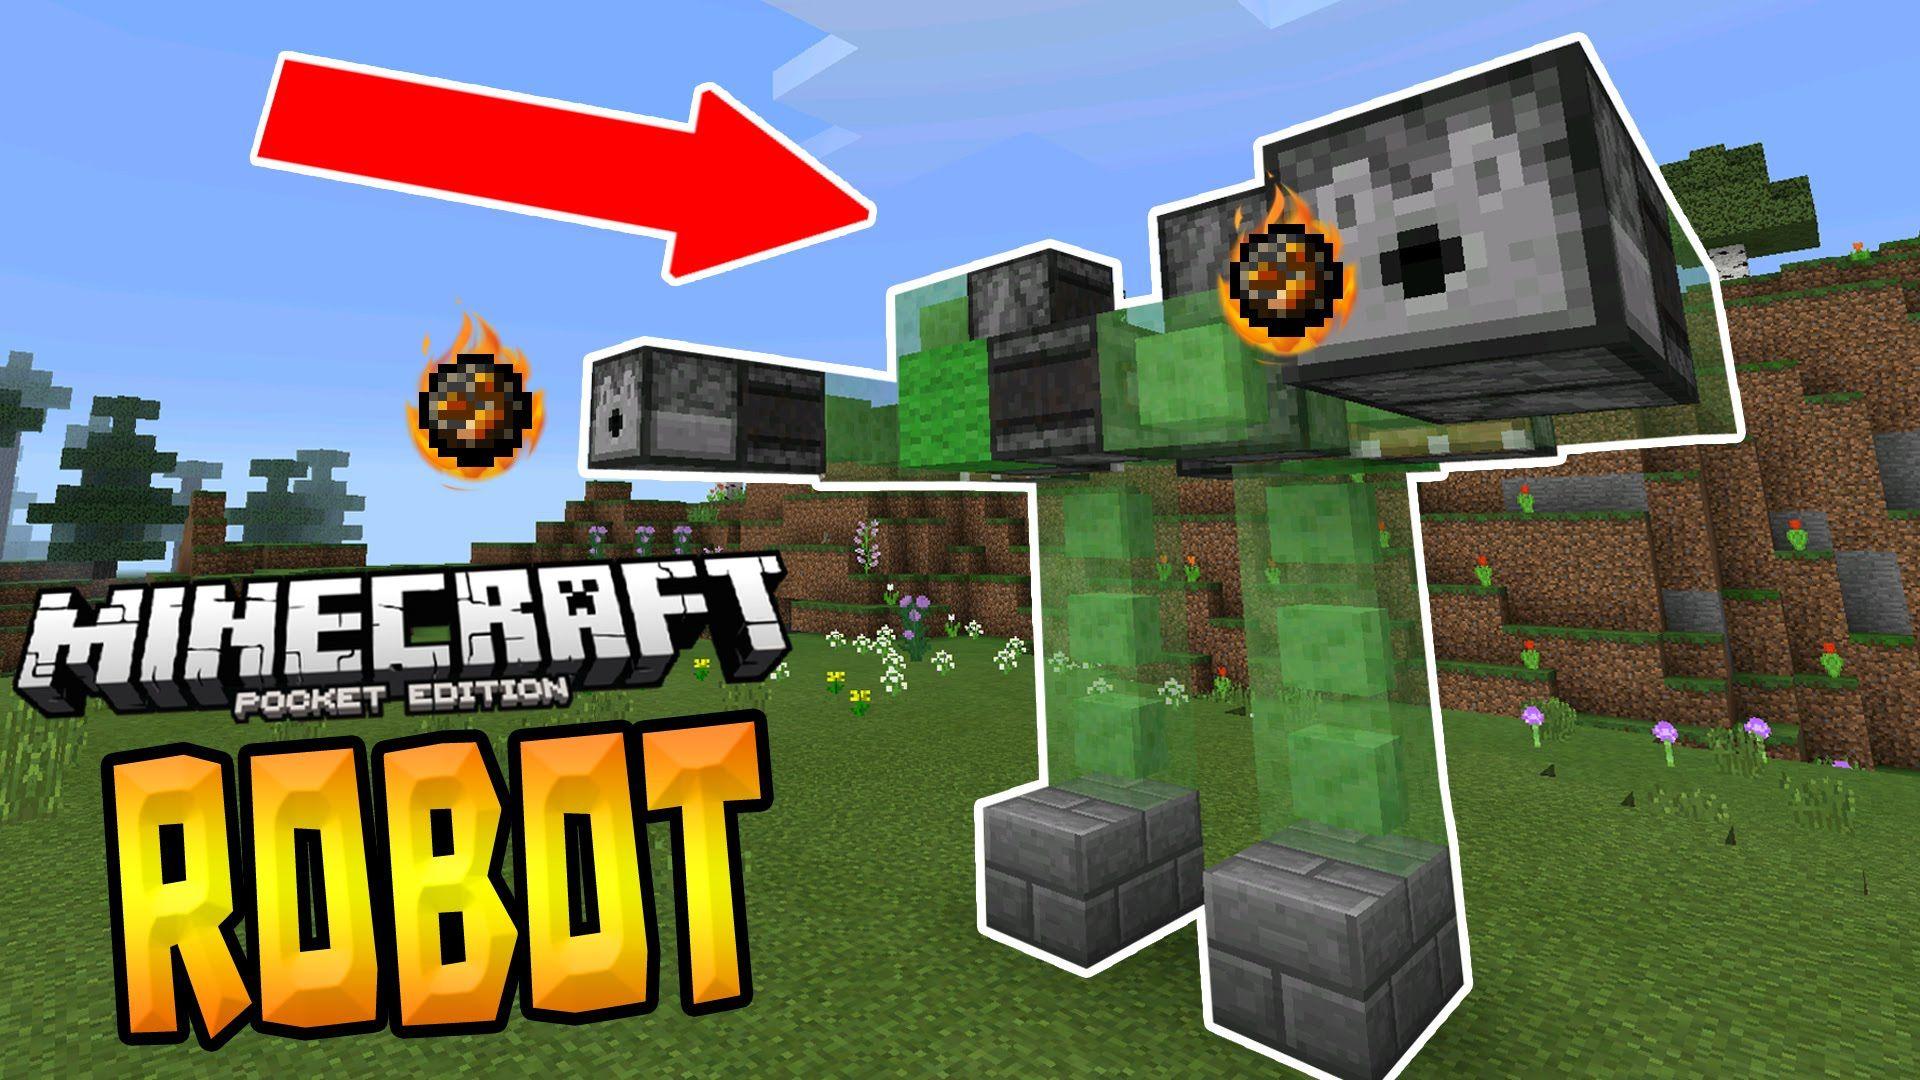 WALKING ROBOT in MCPE!!! - 1 0+ Redstone Creation - Minecraft PE